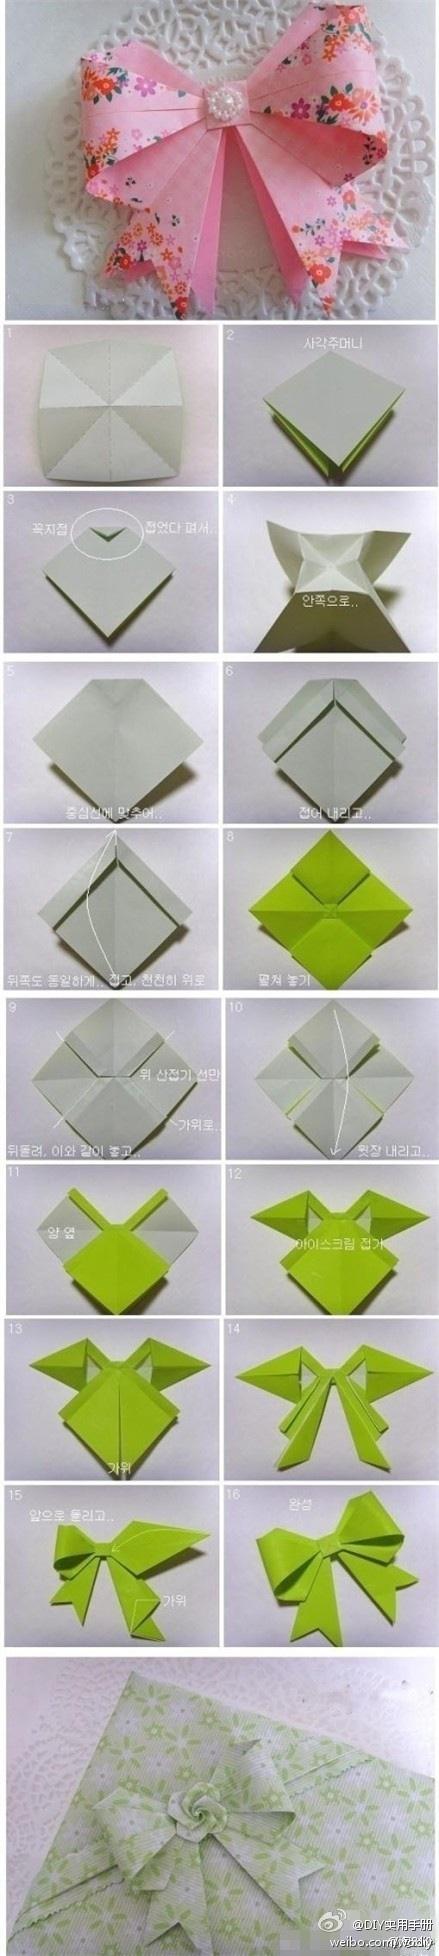 origami-kagittan-fiyonk